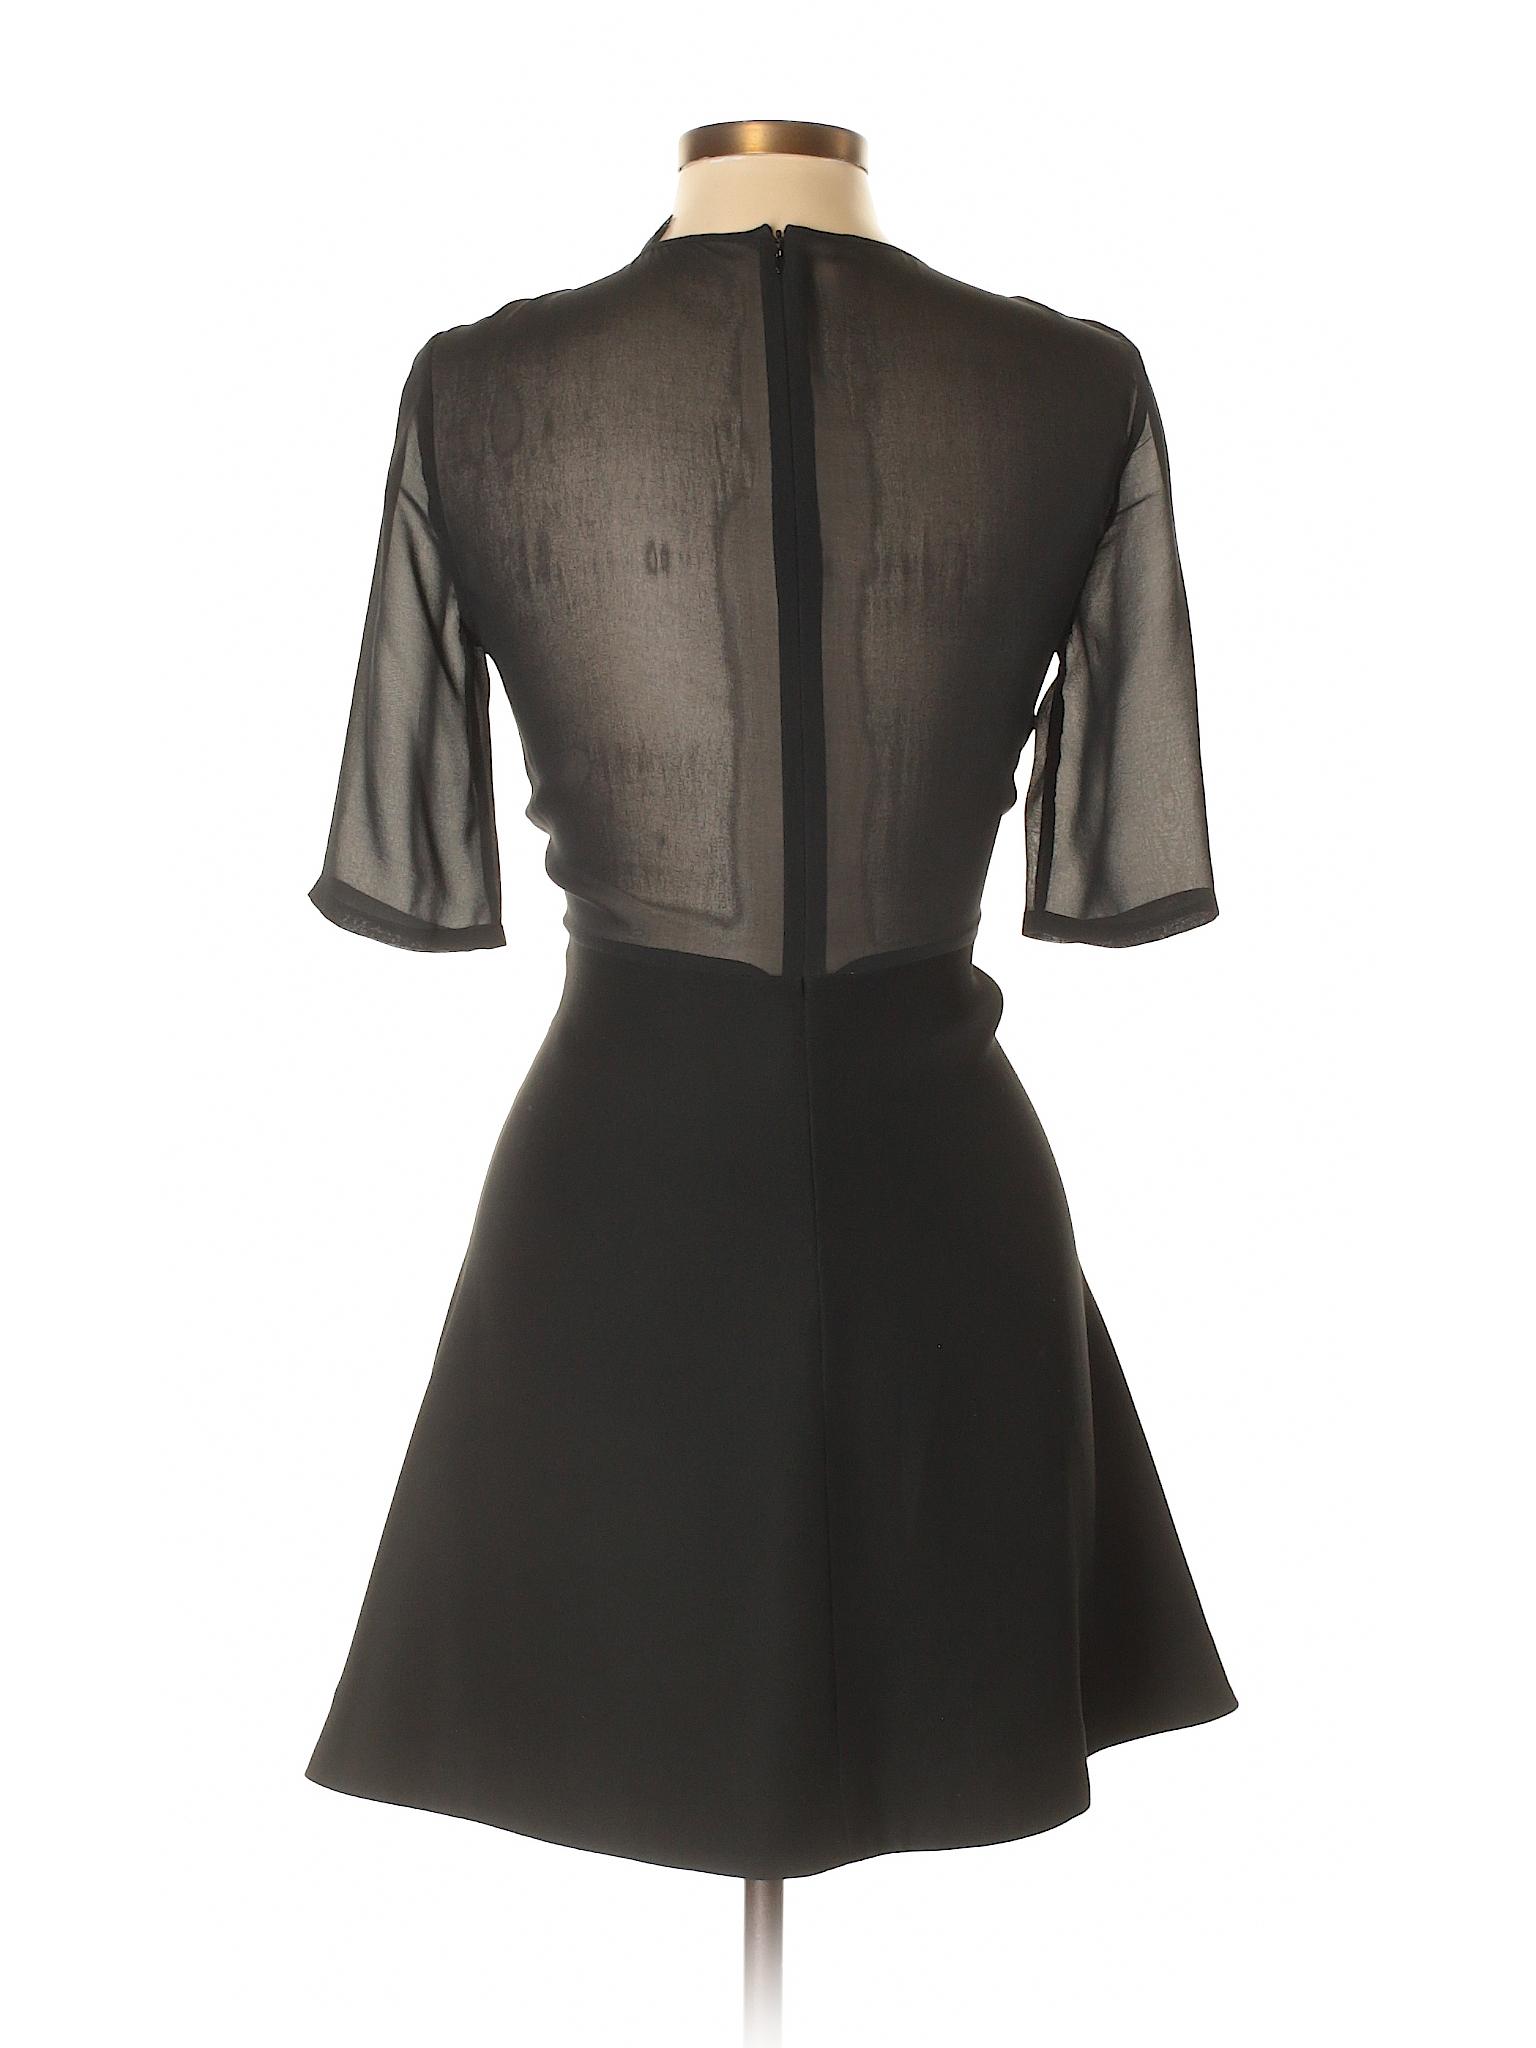 Boutique Dress The Casual Winter Kooples 7zU7qTr